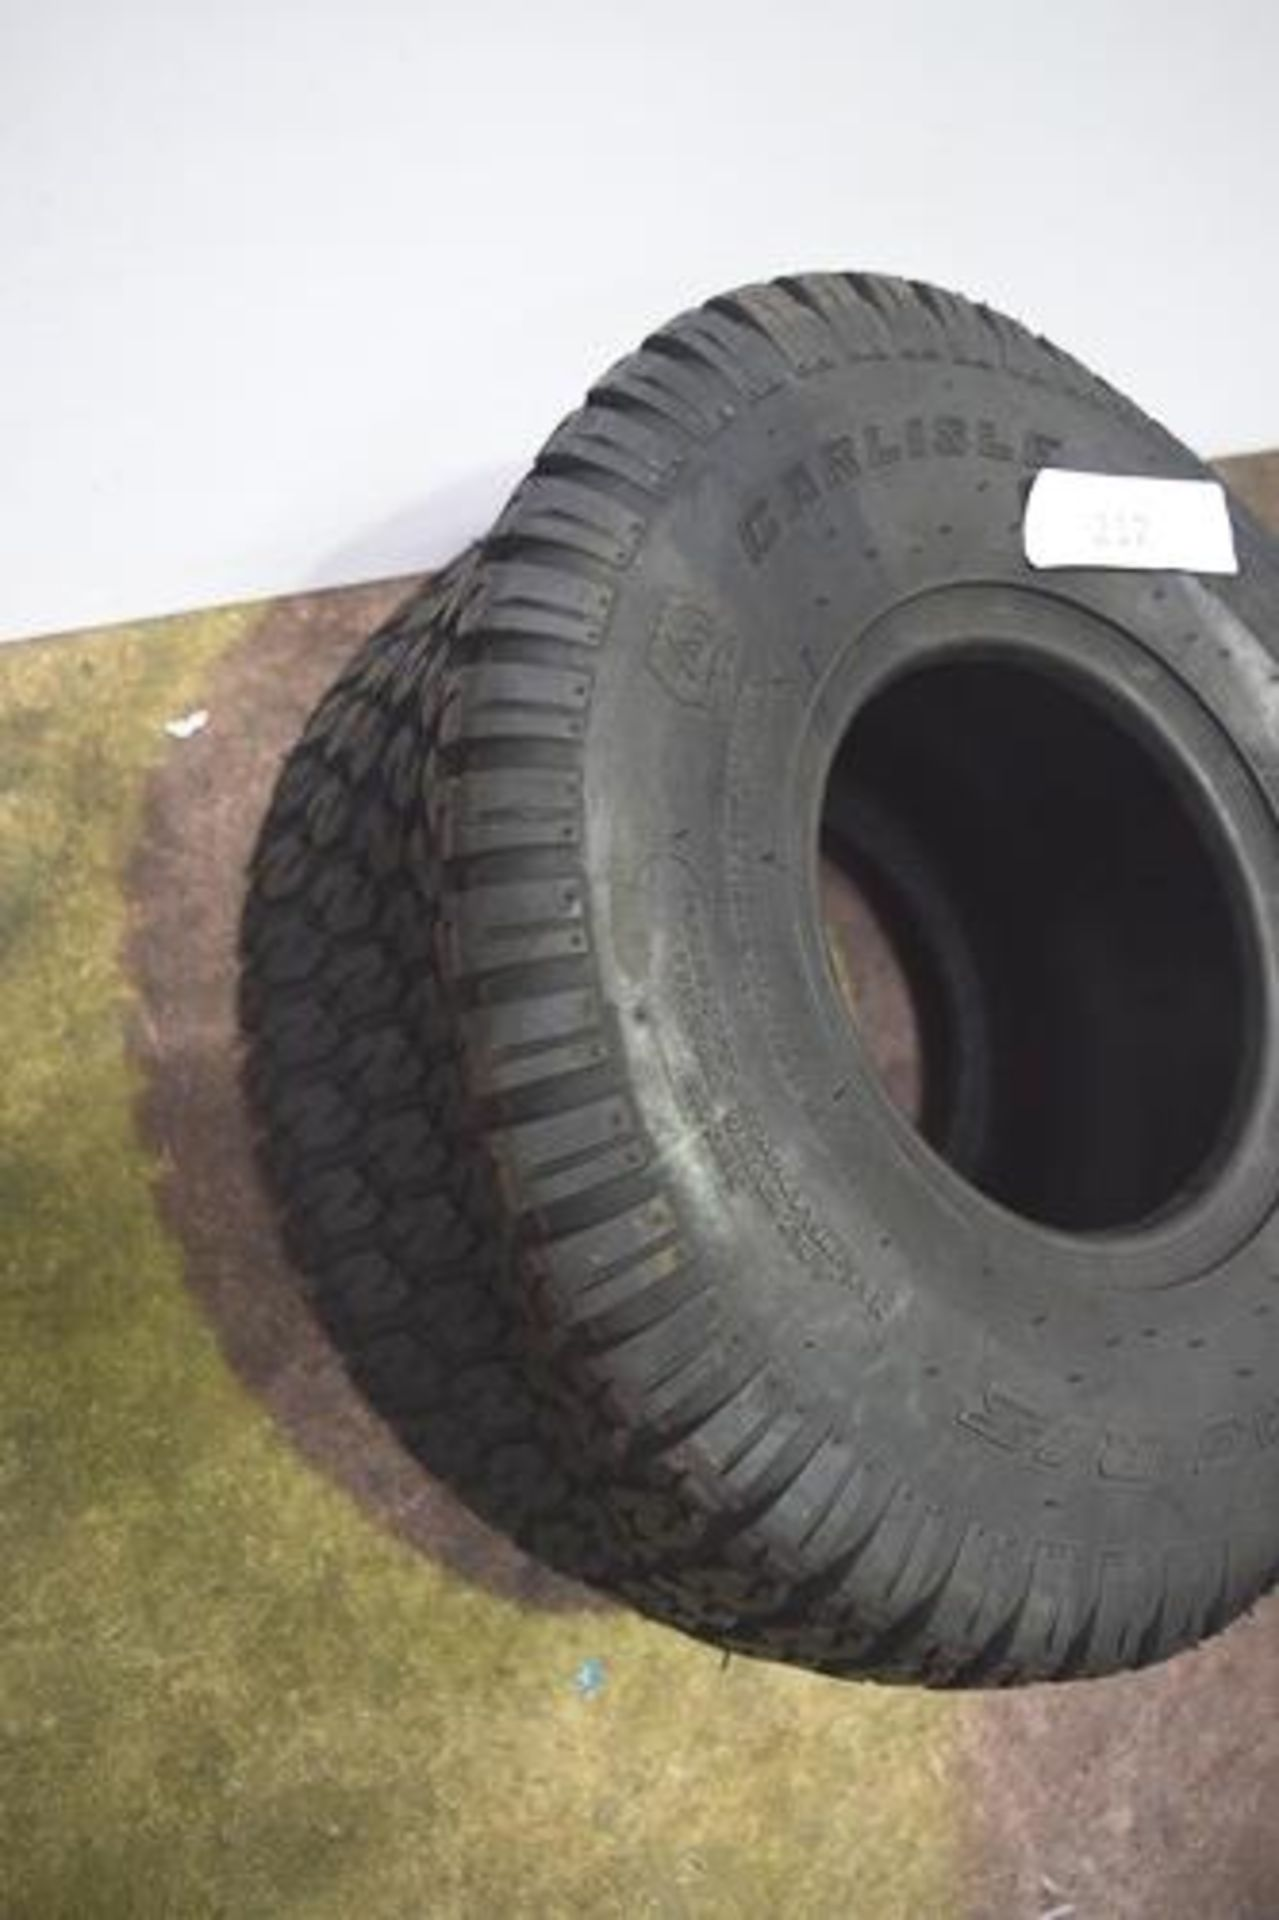 1 x Carlisle Turf Trac R/S 250/60.8 IMP tyre - New (GS10) - Image 2 of 2